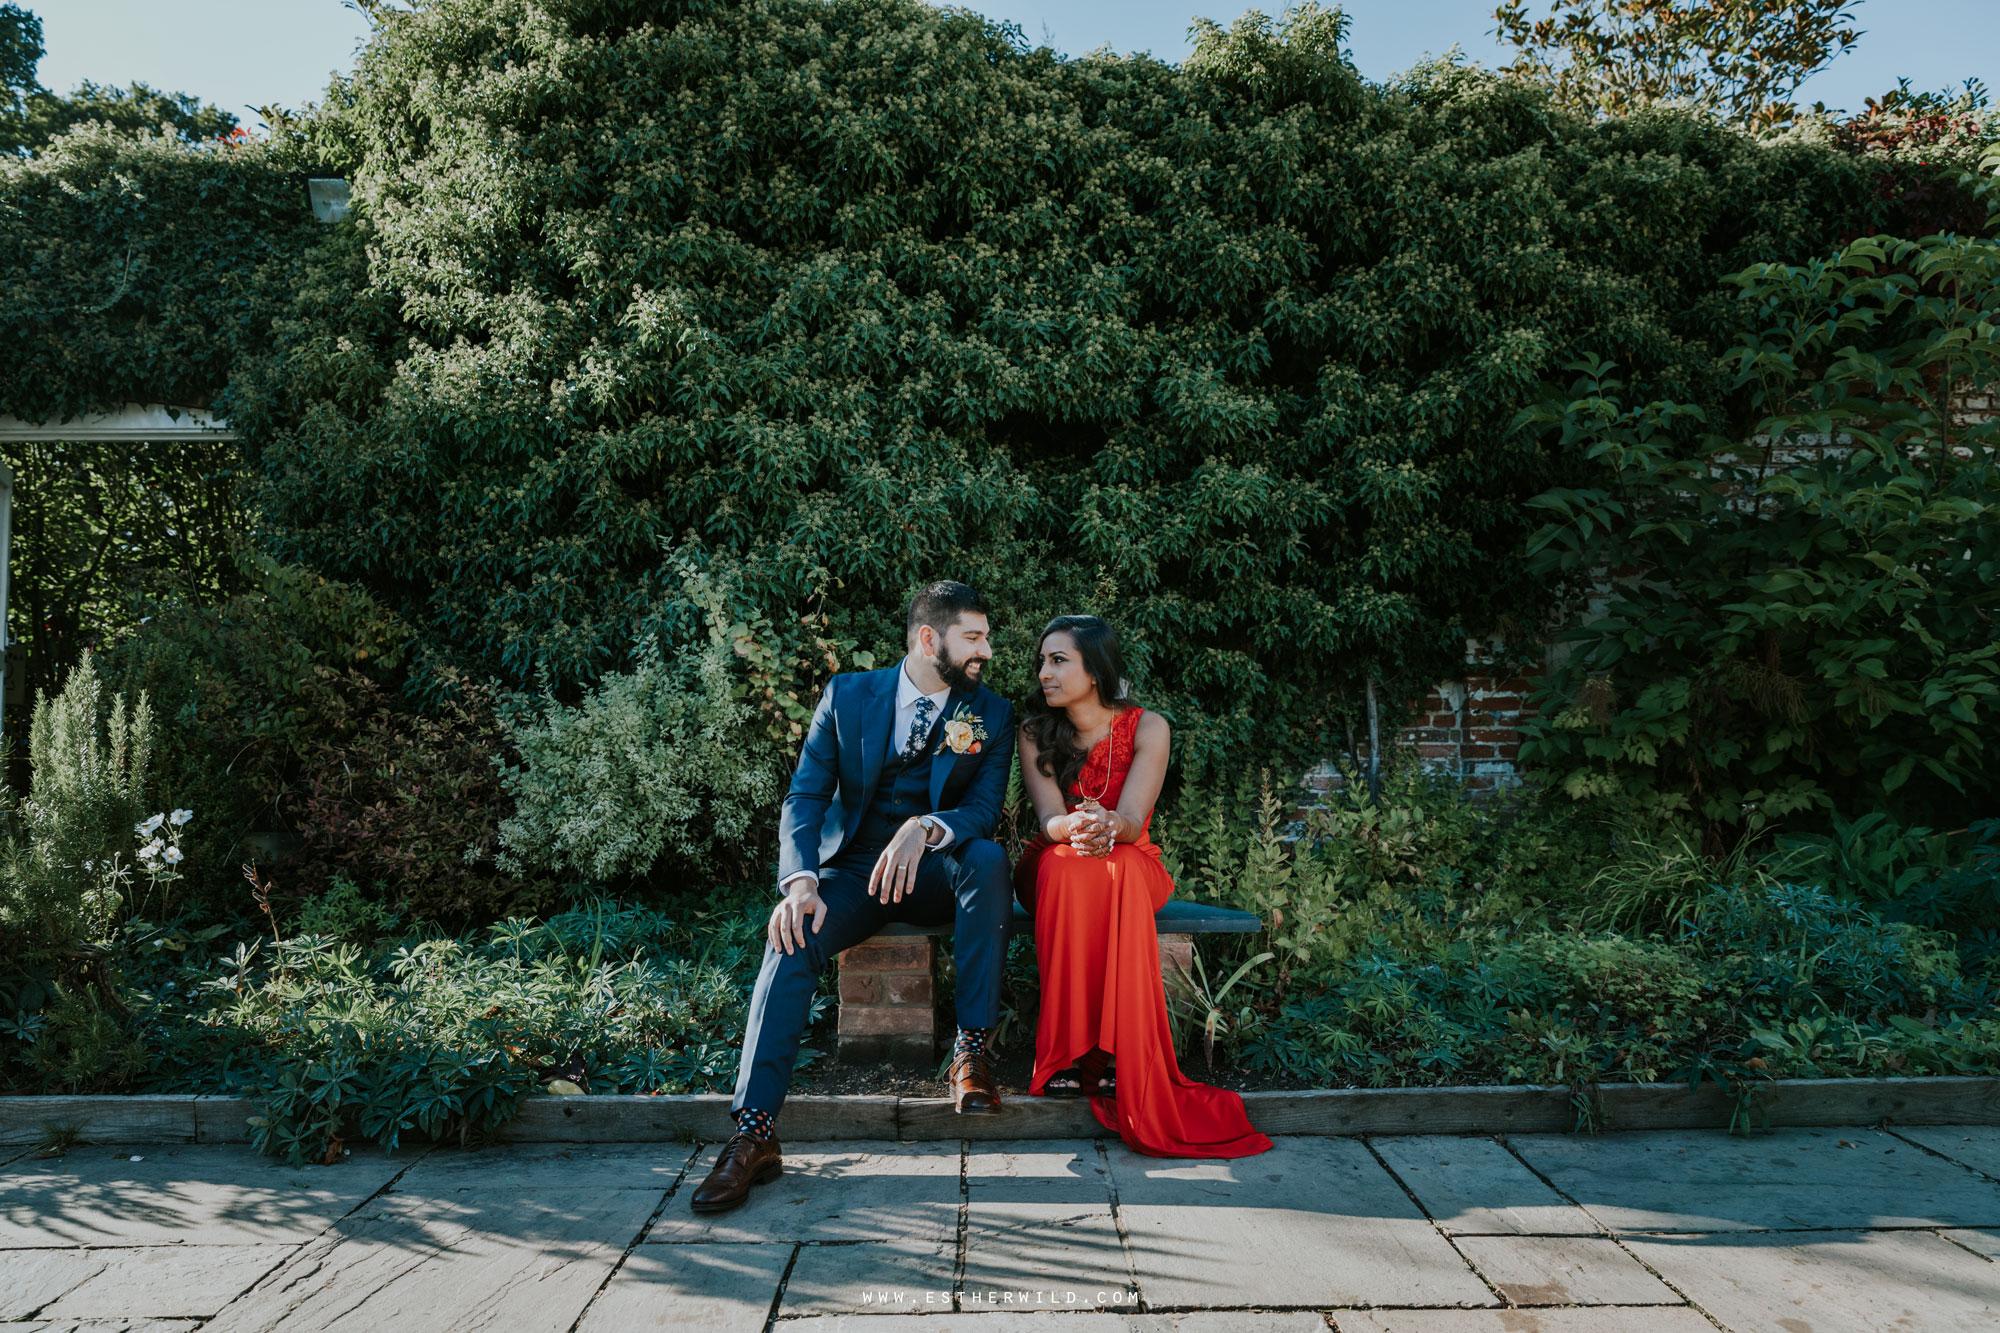 Northbrook_Park_Farnham_Surrey_London_Wedding_Hindu_Fusion_Esther_Wild_Photographer_IMG_5515.jpg